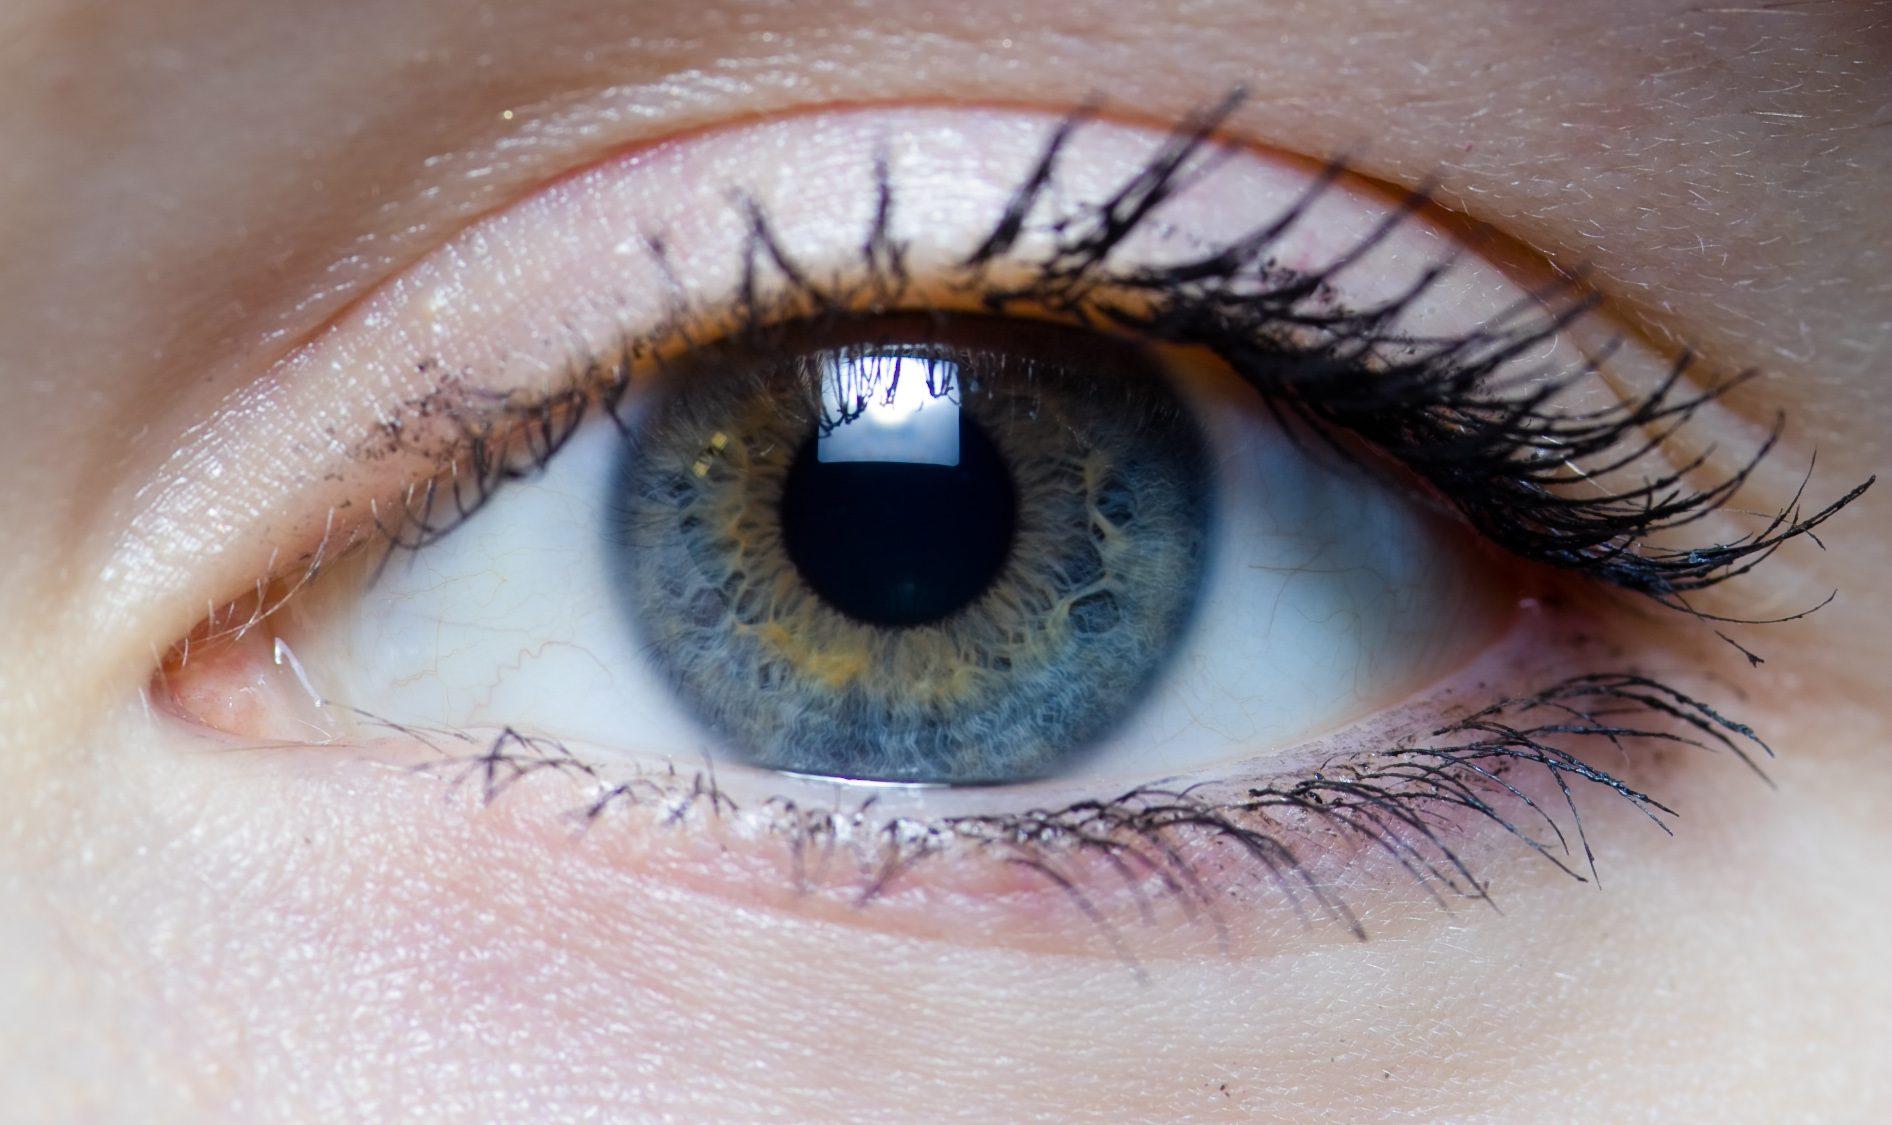 Insight into Eyesight: Reawakening Retinal Stem Cells